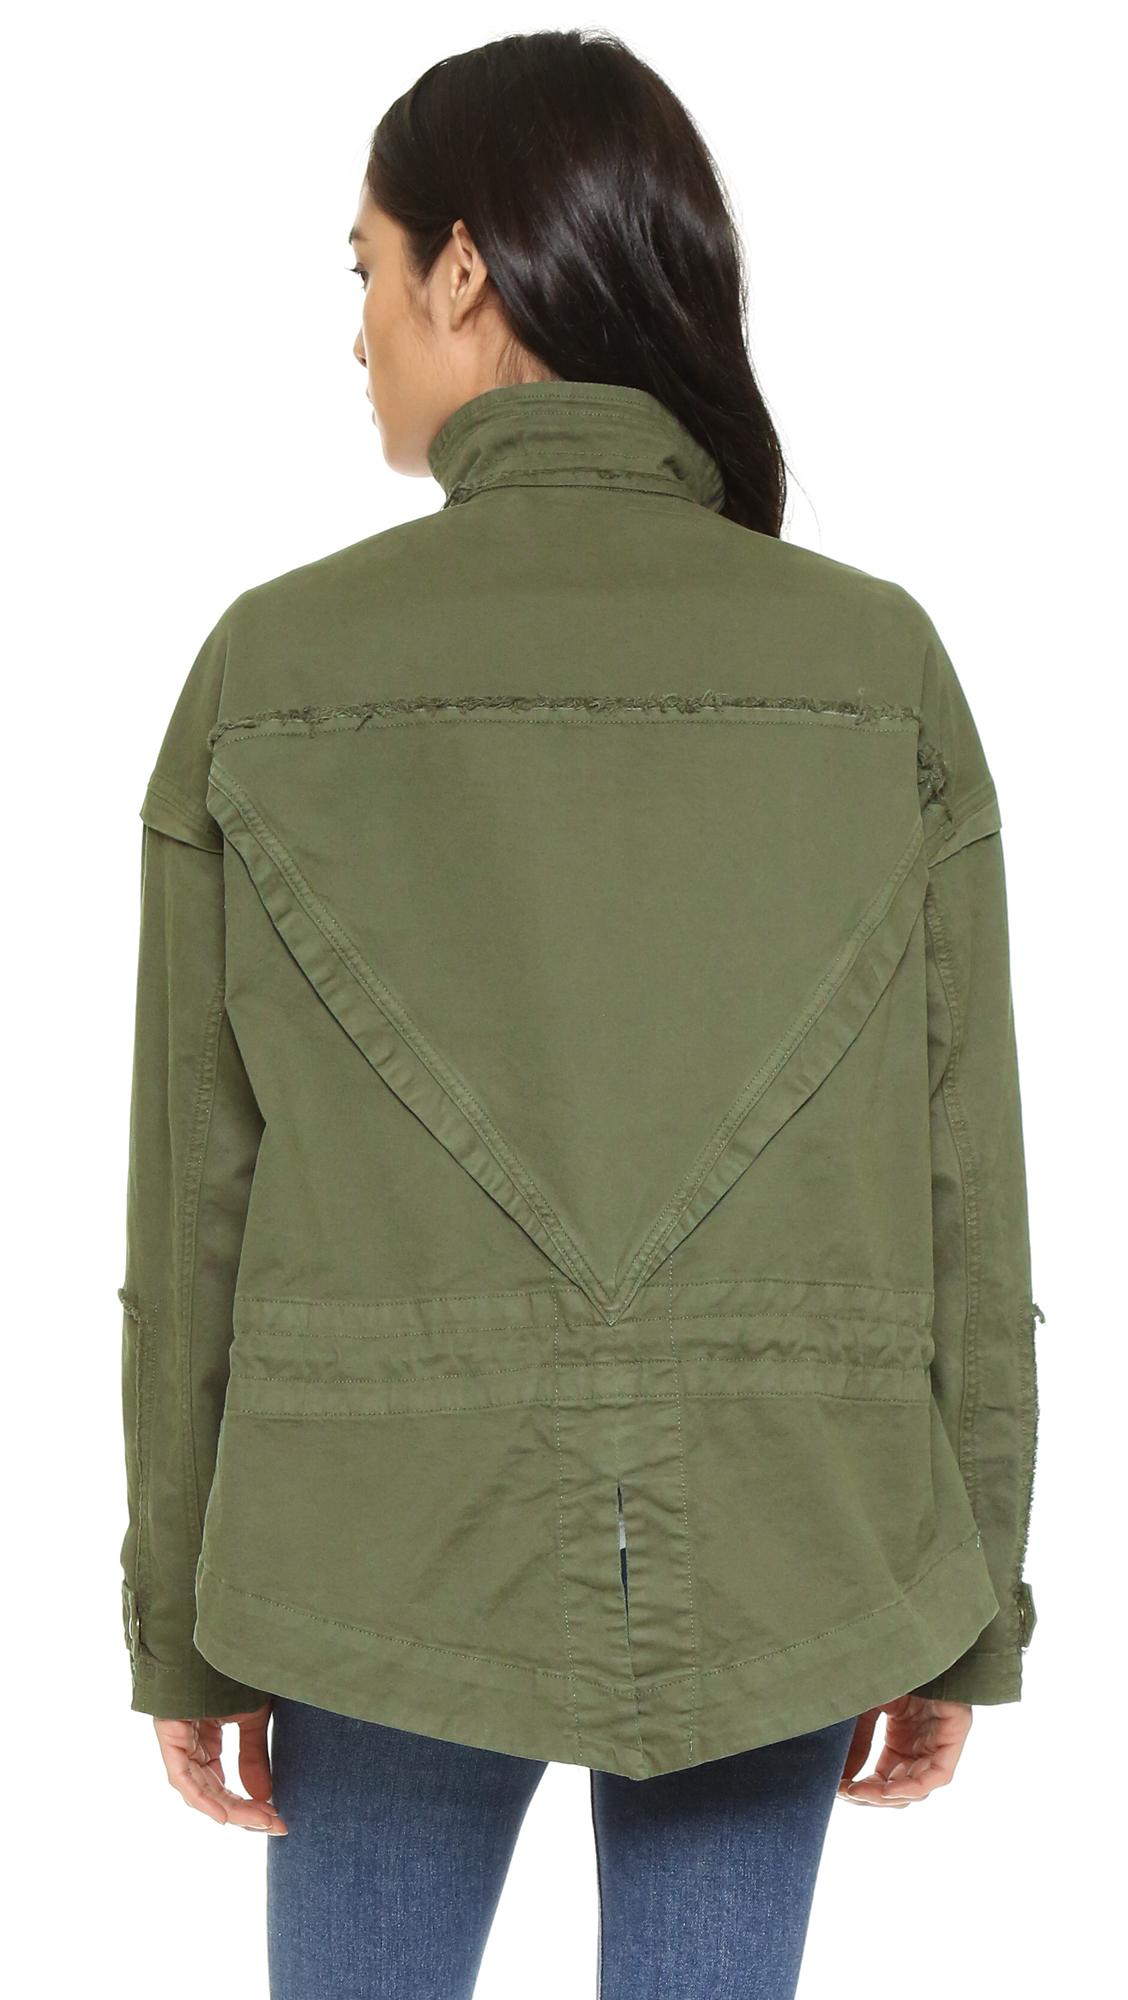 f16a842d31d McGuire Denim Army Jacket